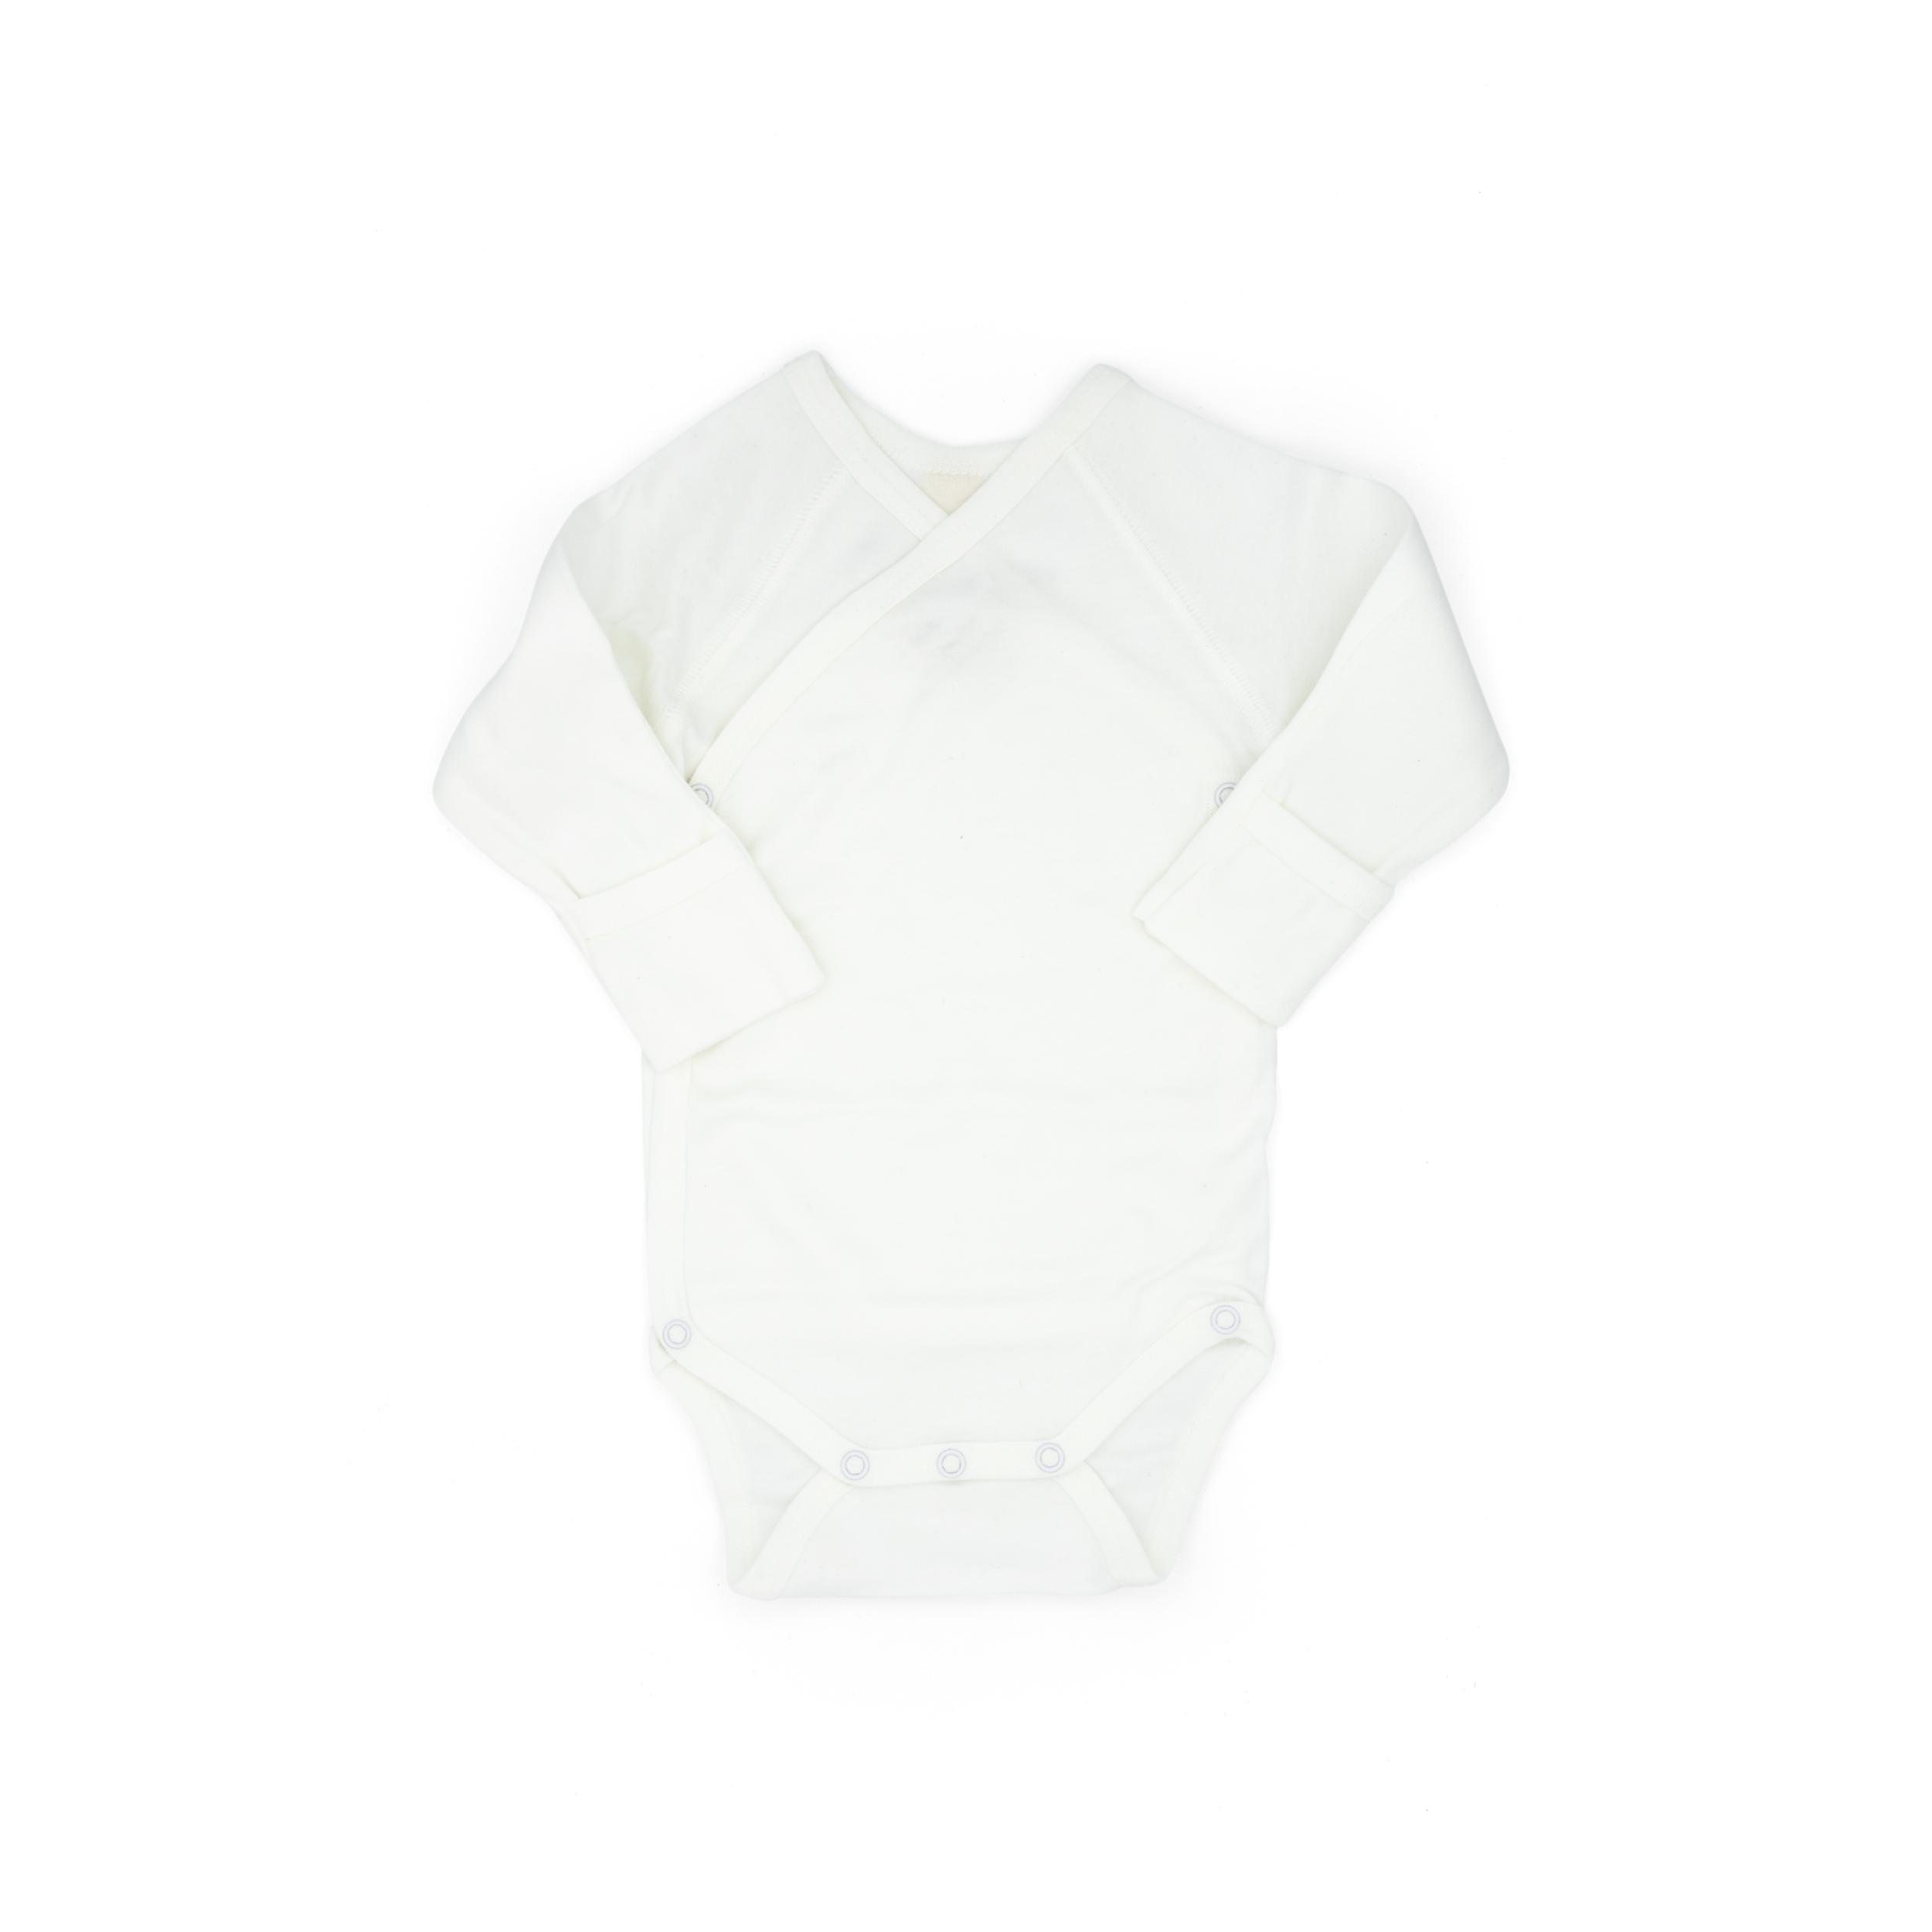 Babysuit  size 56, organic, nail protection